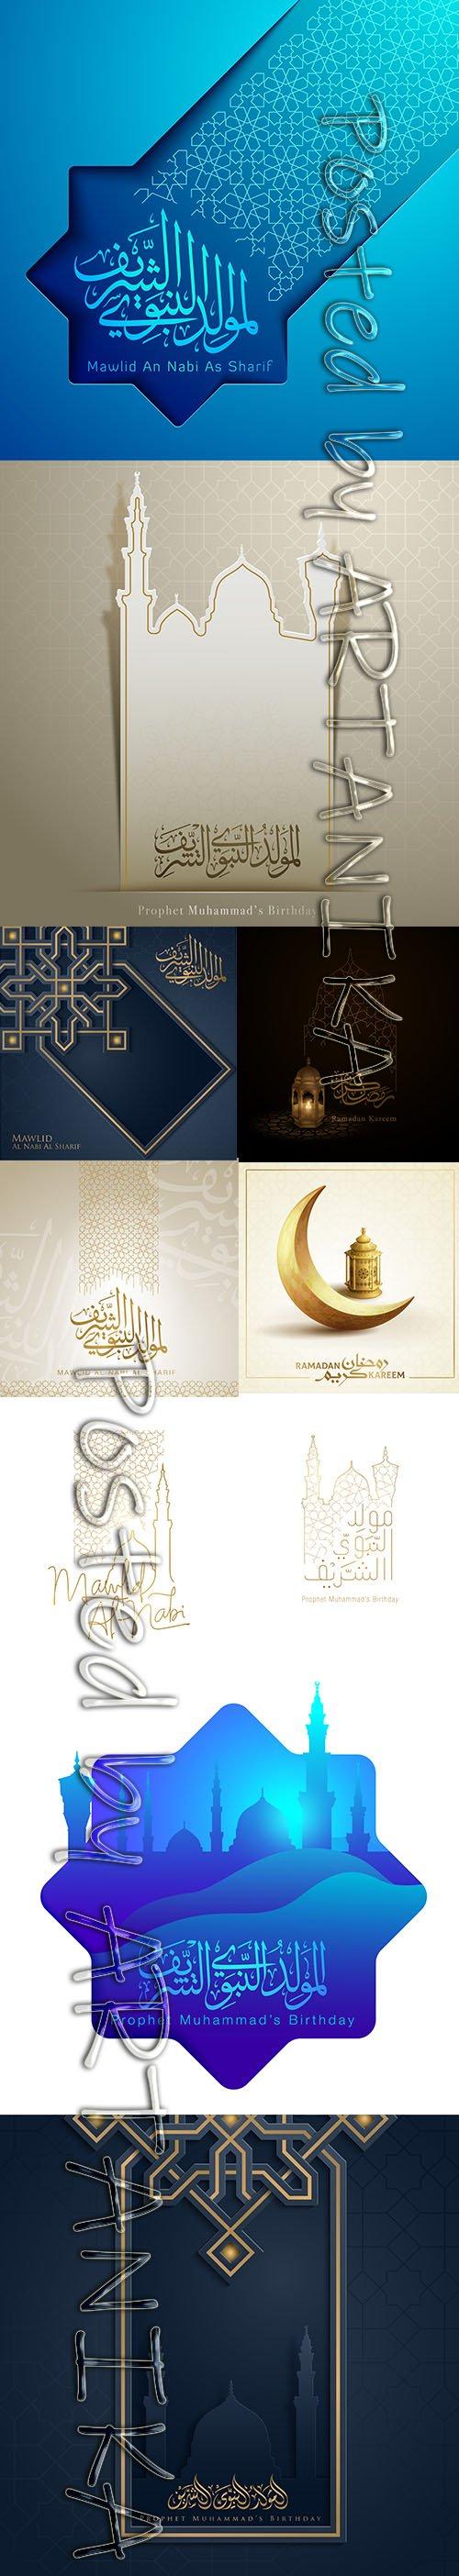 Vector Greeting Card of Arabic Design Illustrations Vol 2